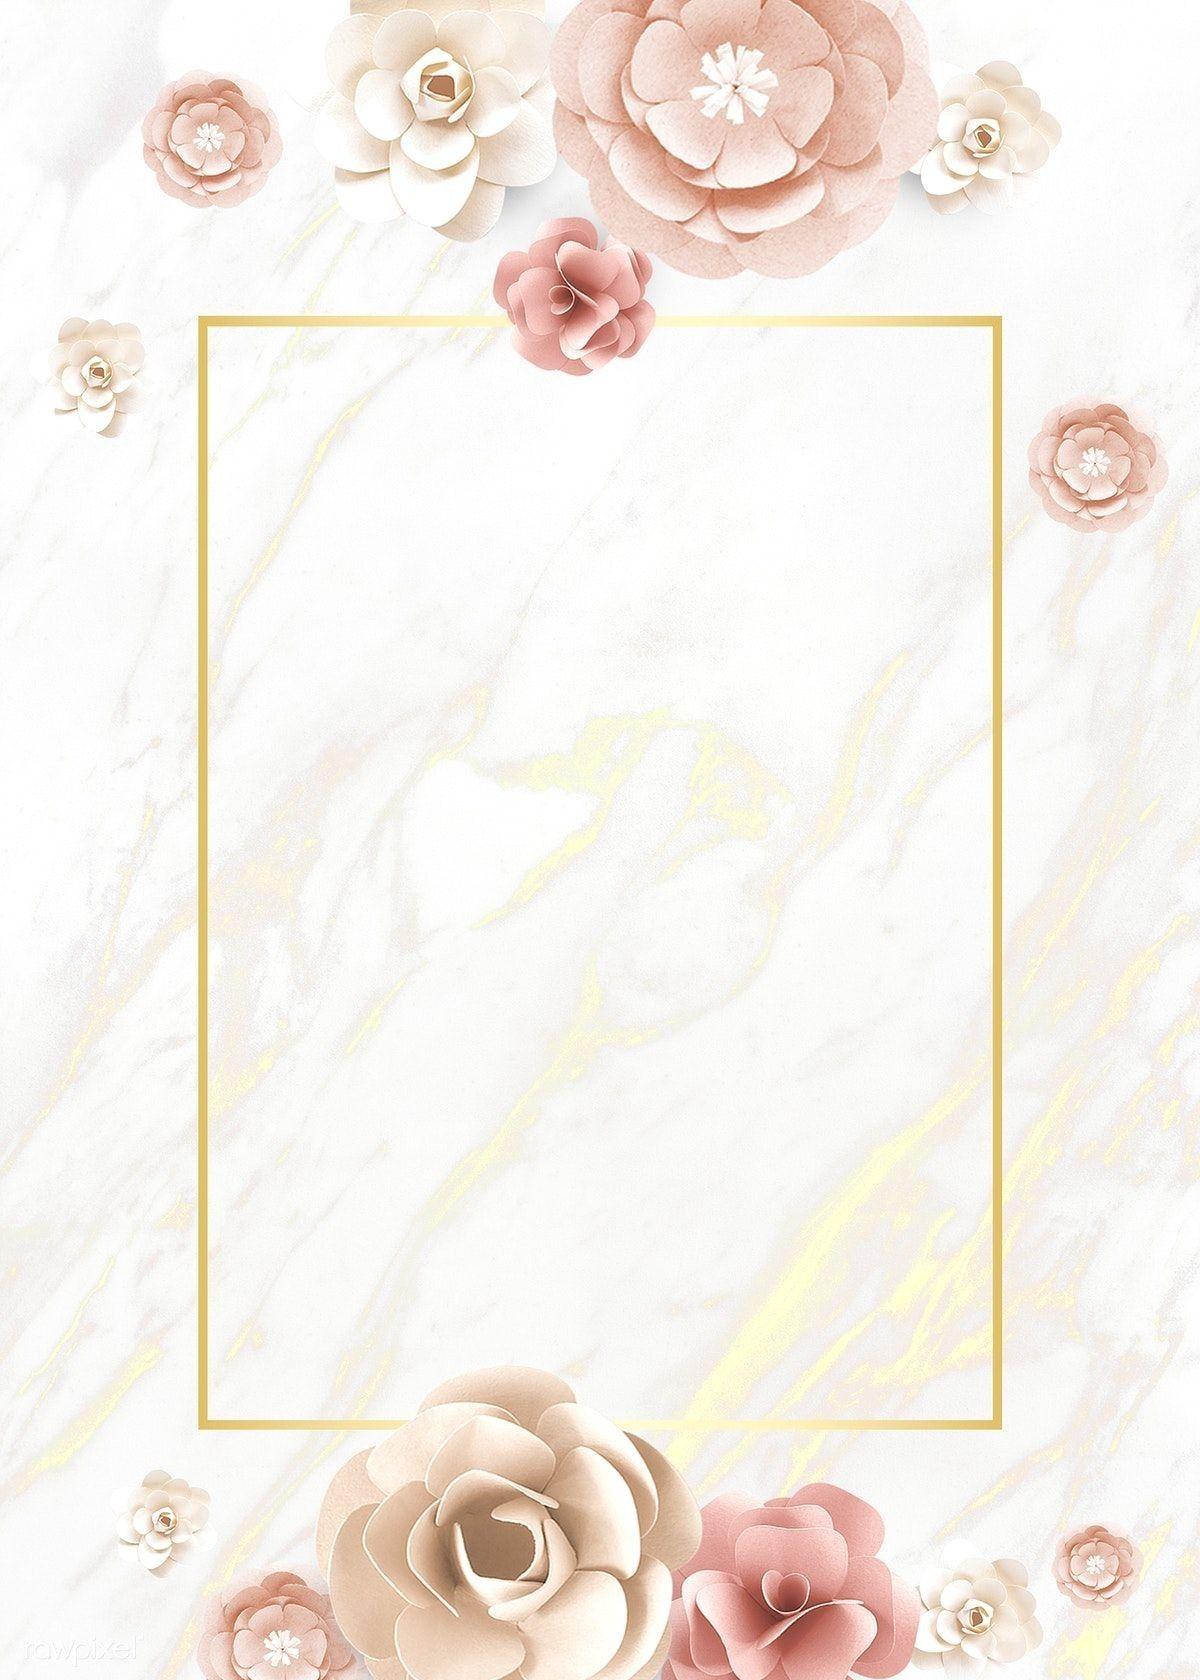 Pin By Cantik Manis On TARJETAS PARA LLENAR   Flower Crafts, Floral Poster,  Flower Background Wallpaper